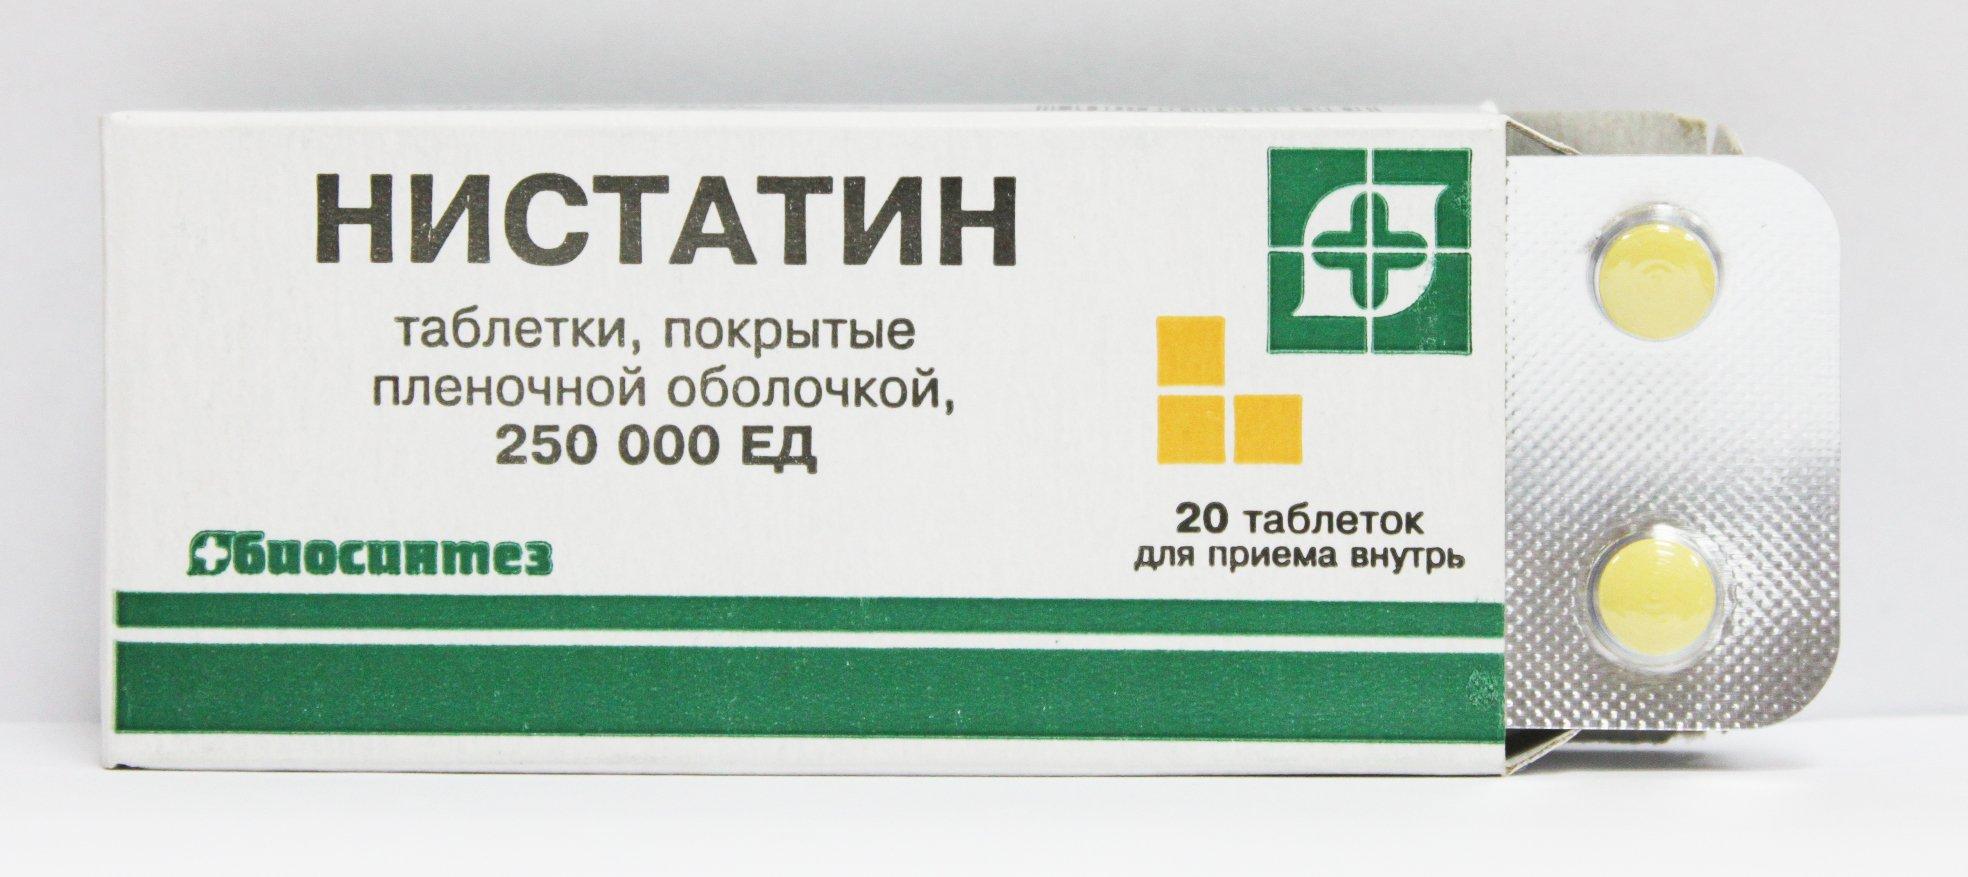 Состав и форма выпуска препарата Нистатин